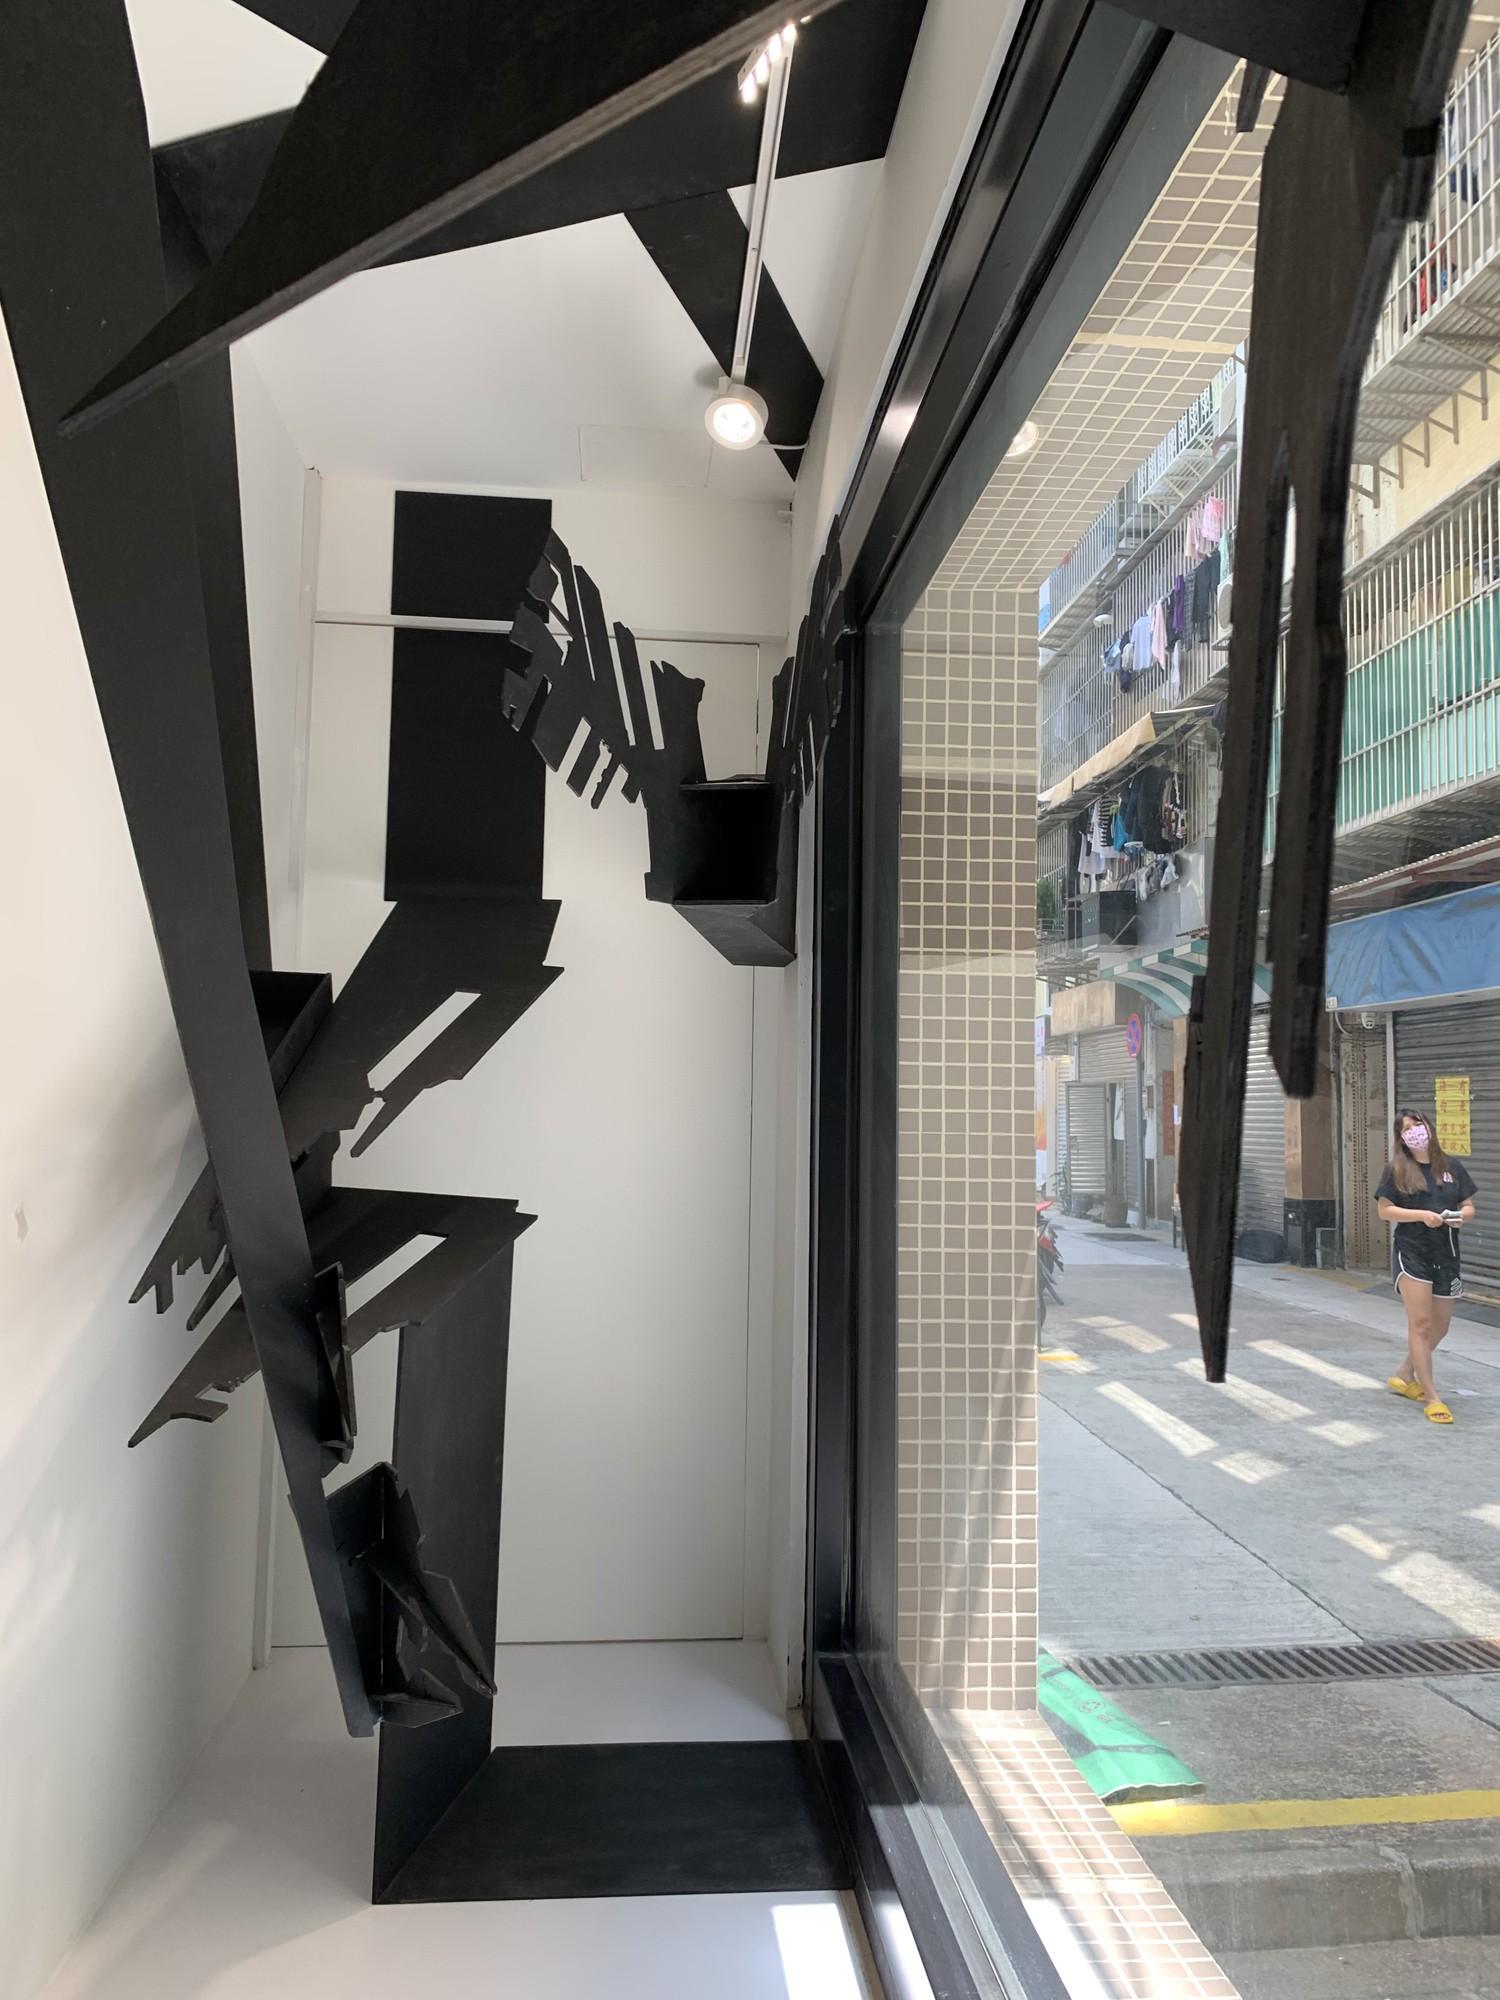 installation_infra_macau_studiofrankhavermans_by_impromptu_23